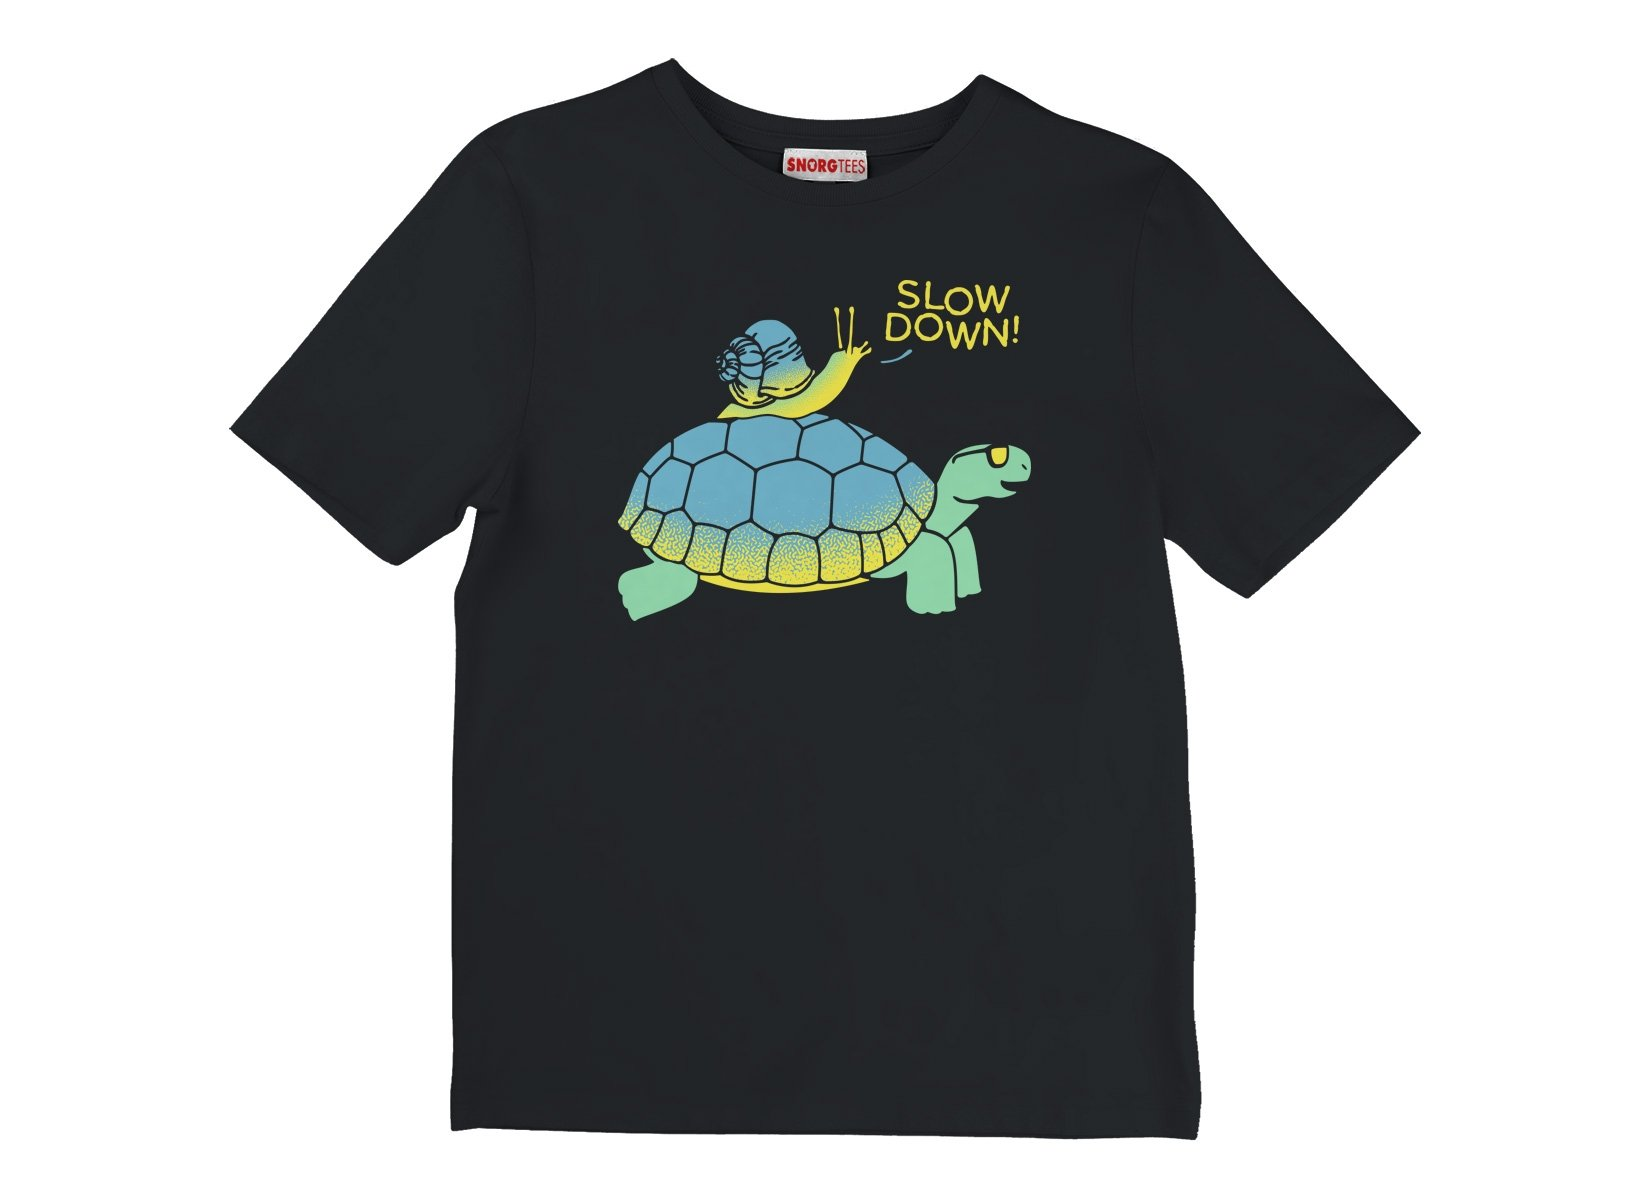 Slow Down! on Kids T-Shirt